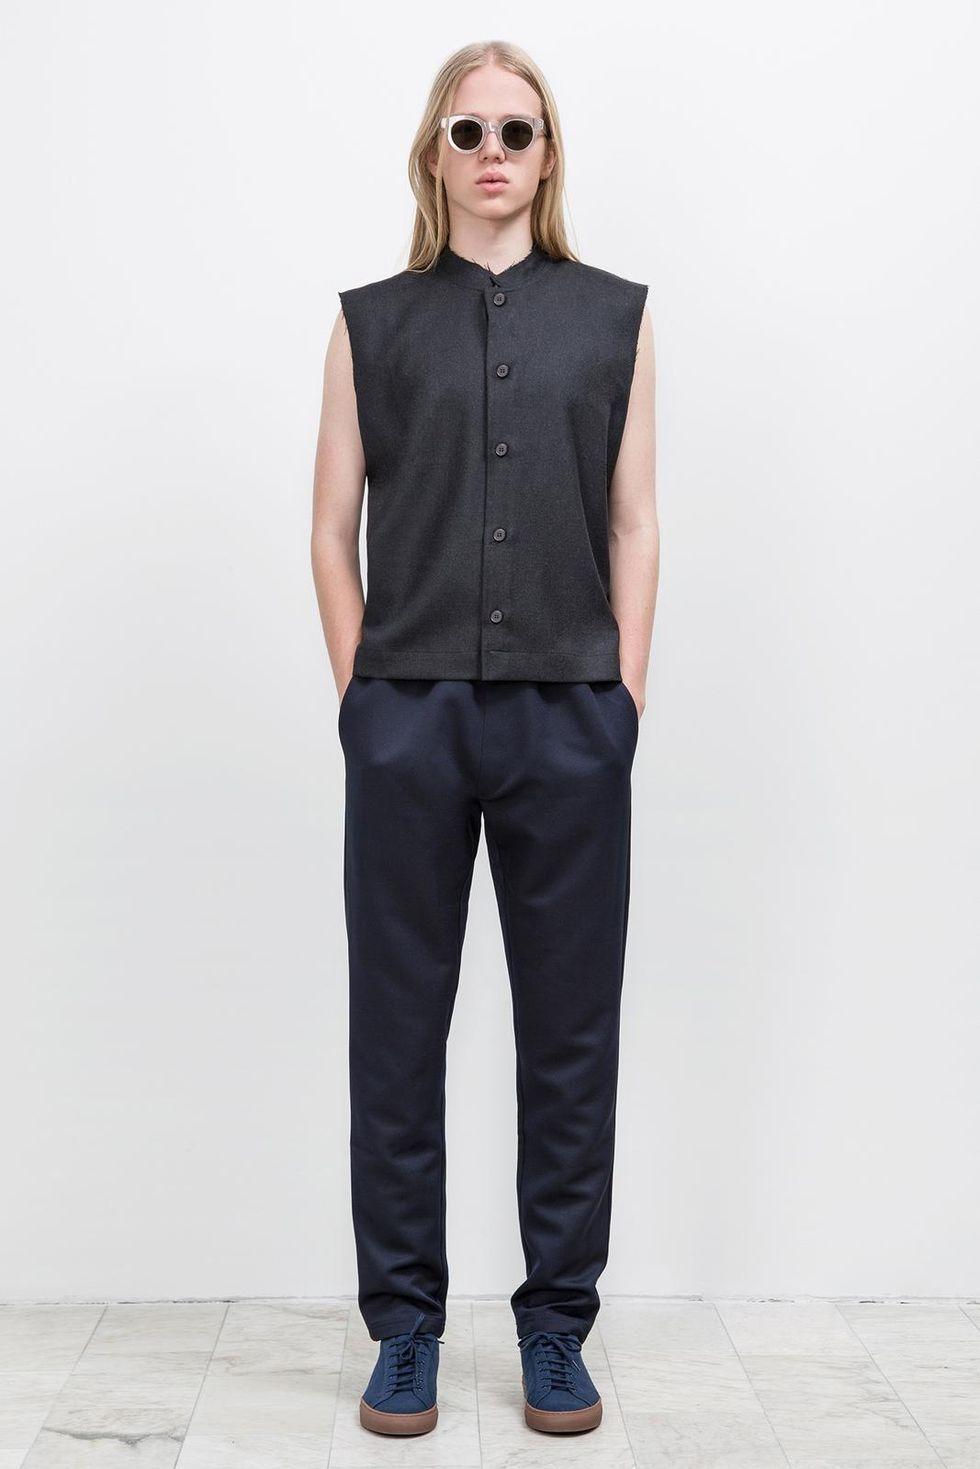 tres-bien-menswear-collection-spring-summer-2015-04.jpg